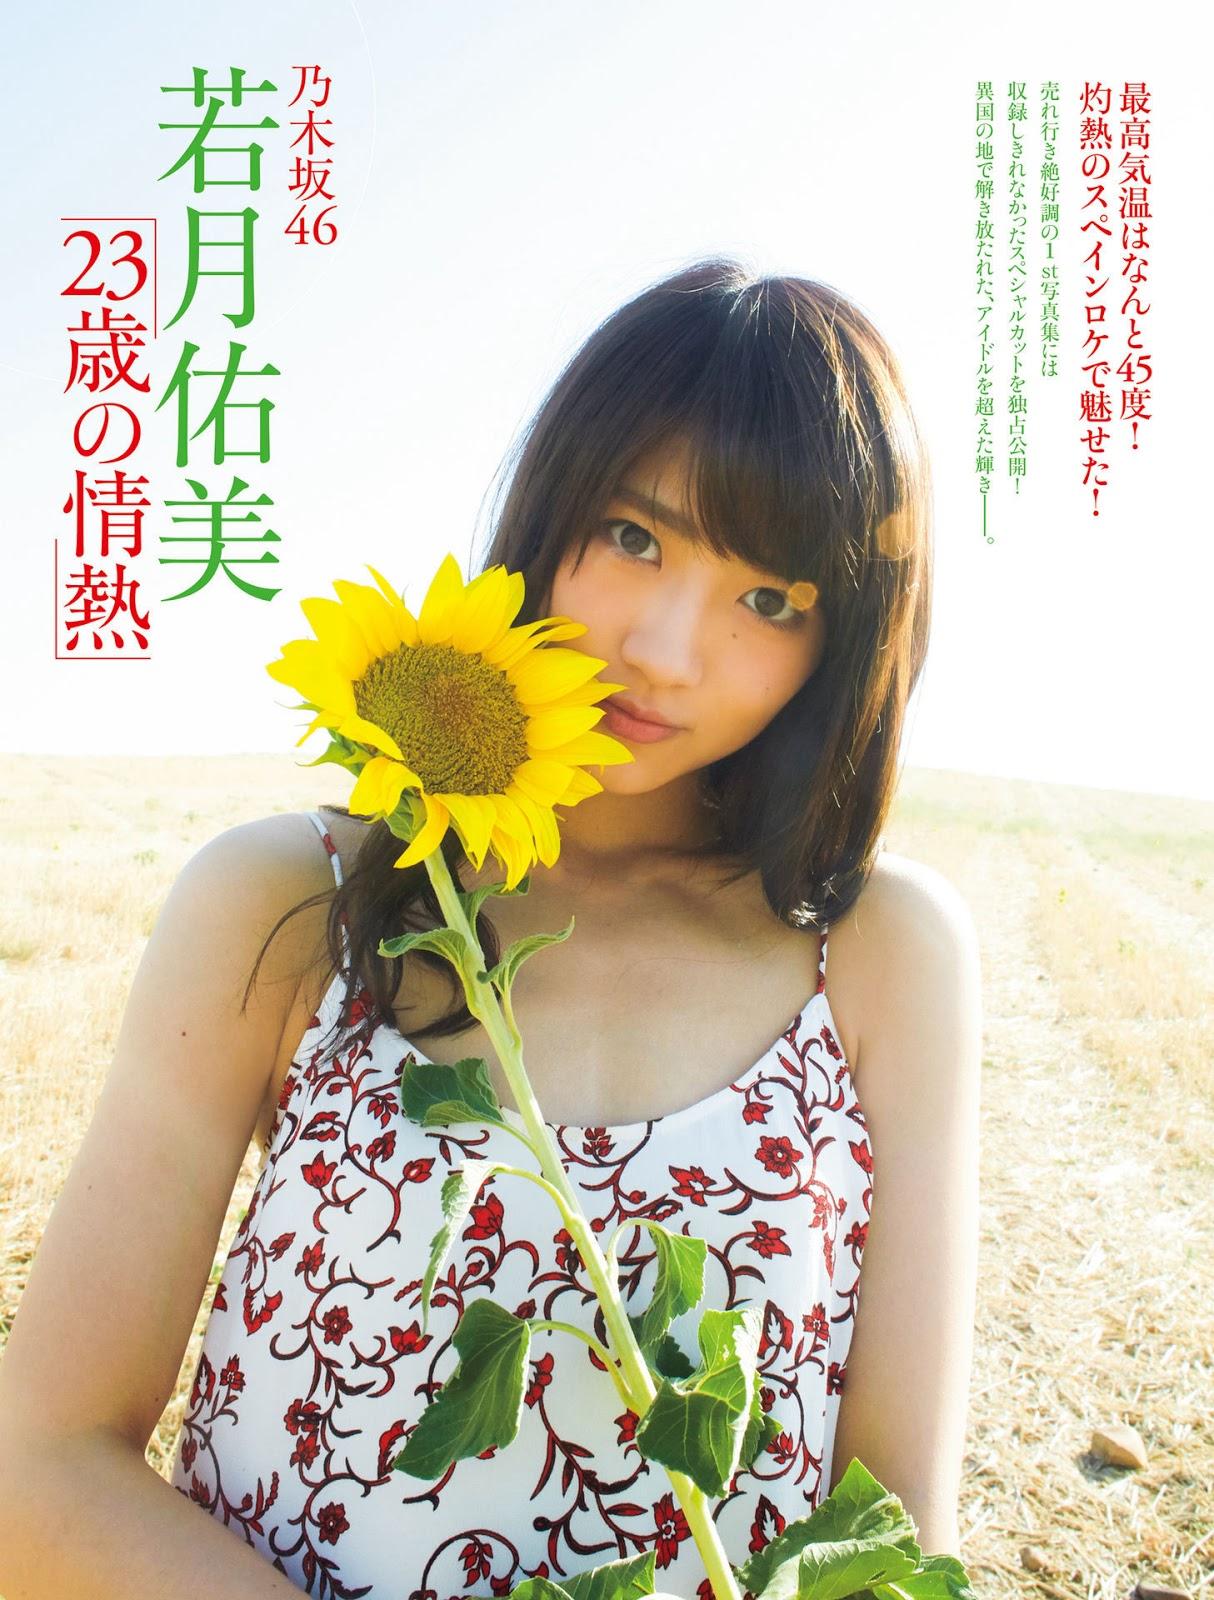 Wakatsuki Yumi 若月佑美, FRIDAY 2017.11.24 (フライデー 2017年11月24日号)